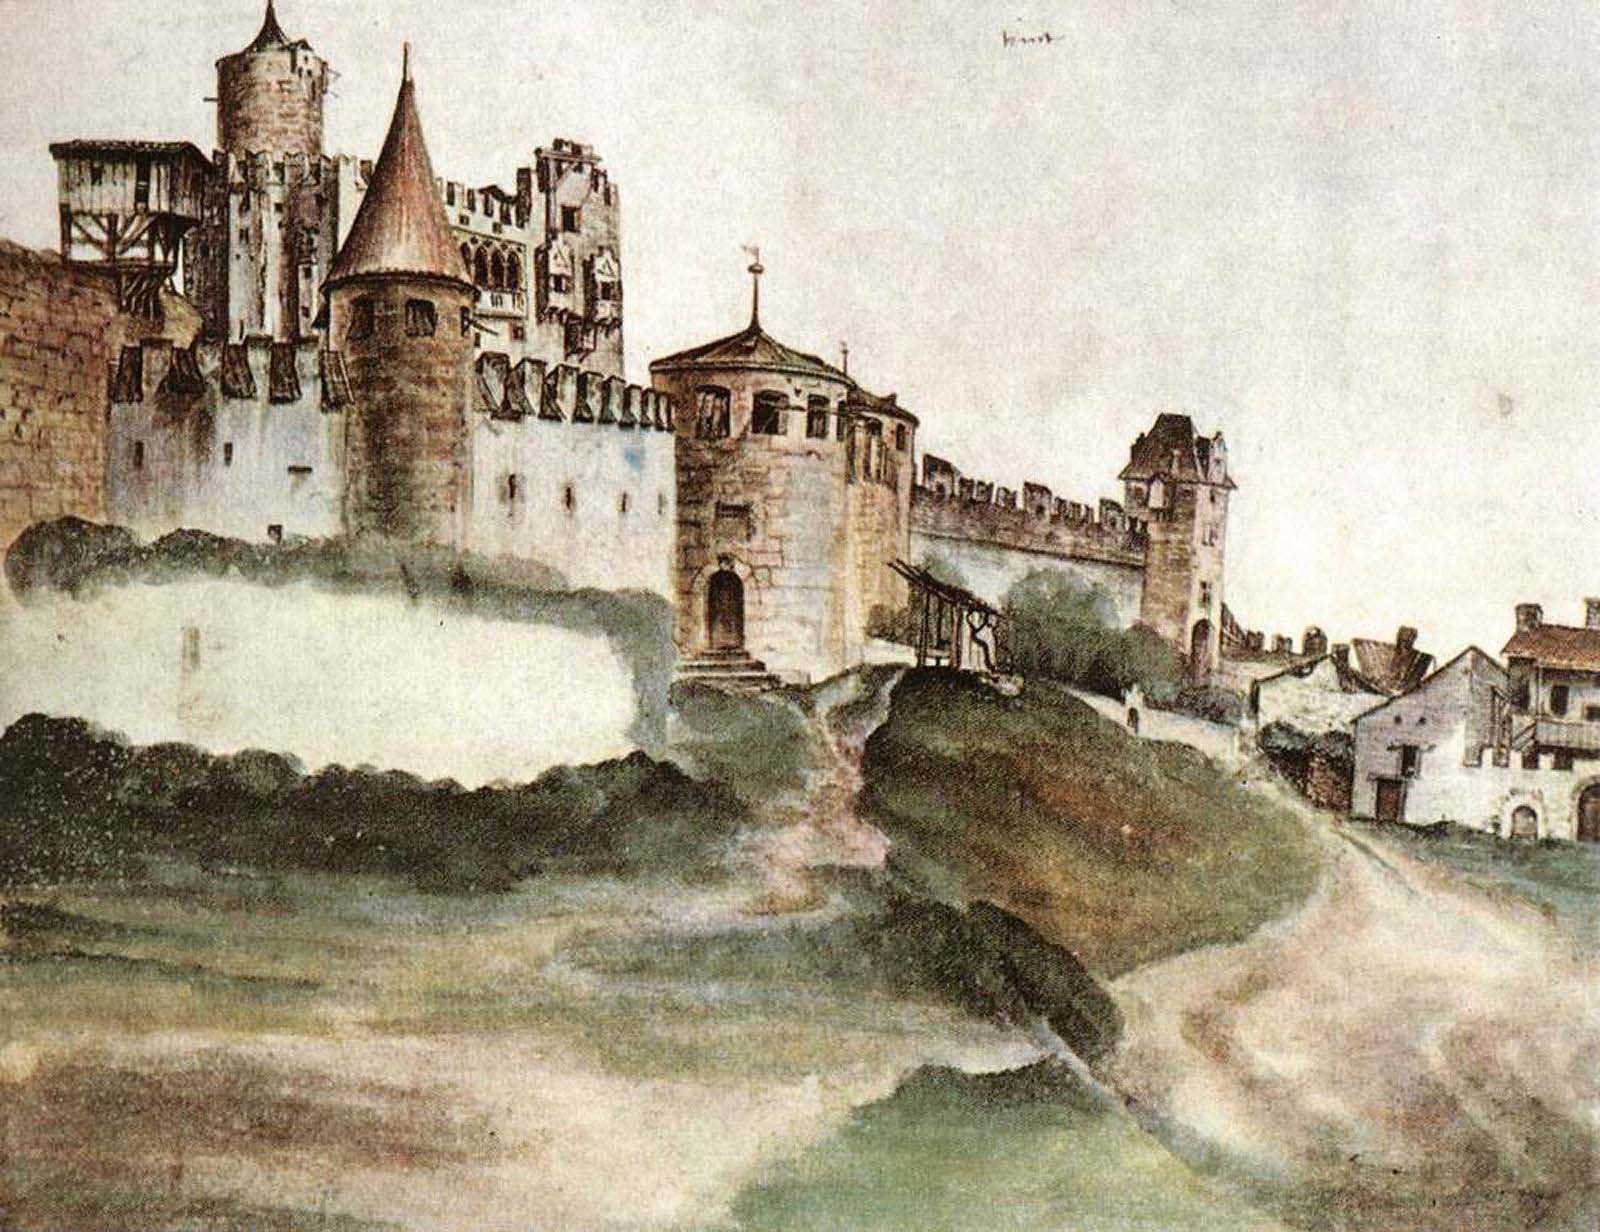 Albrecht Dürer, Das Schloss von Trient, 1495